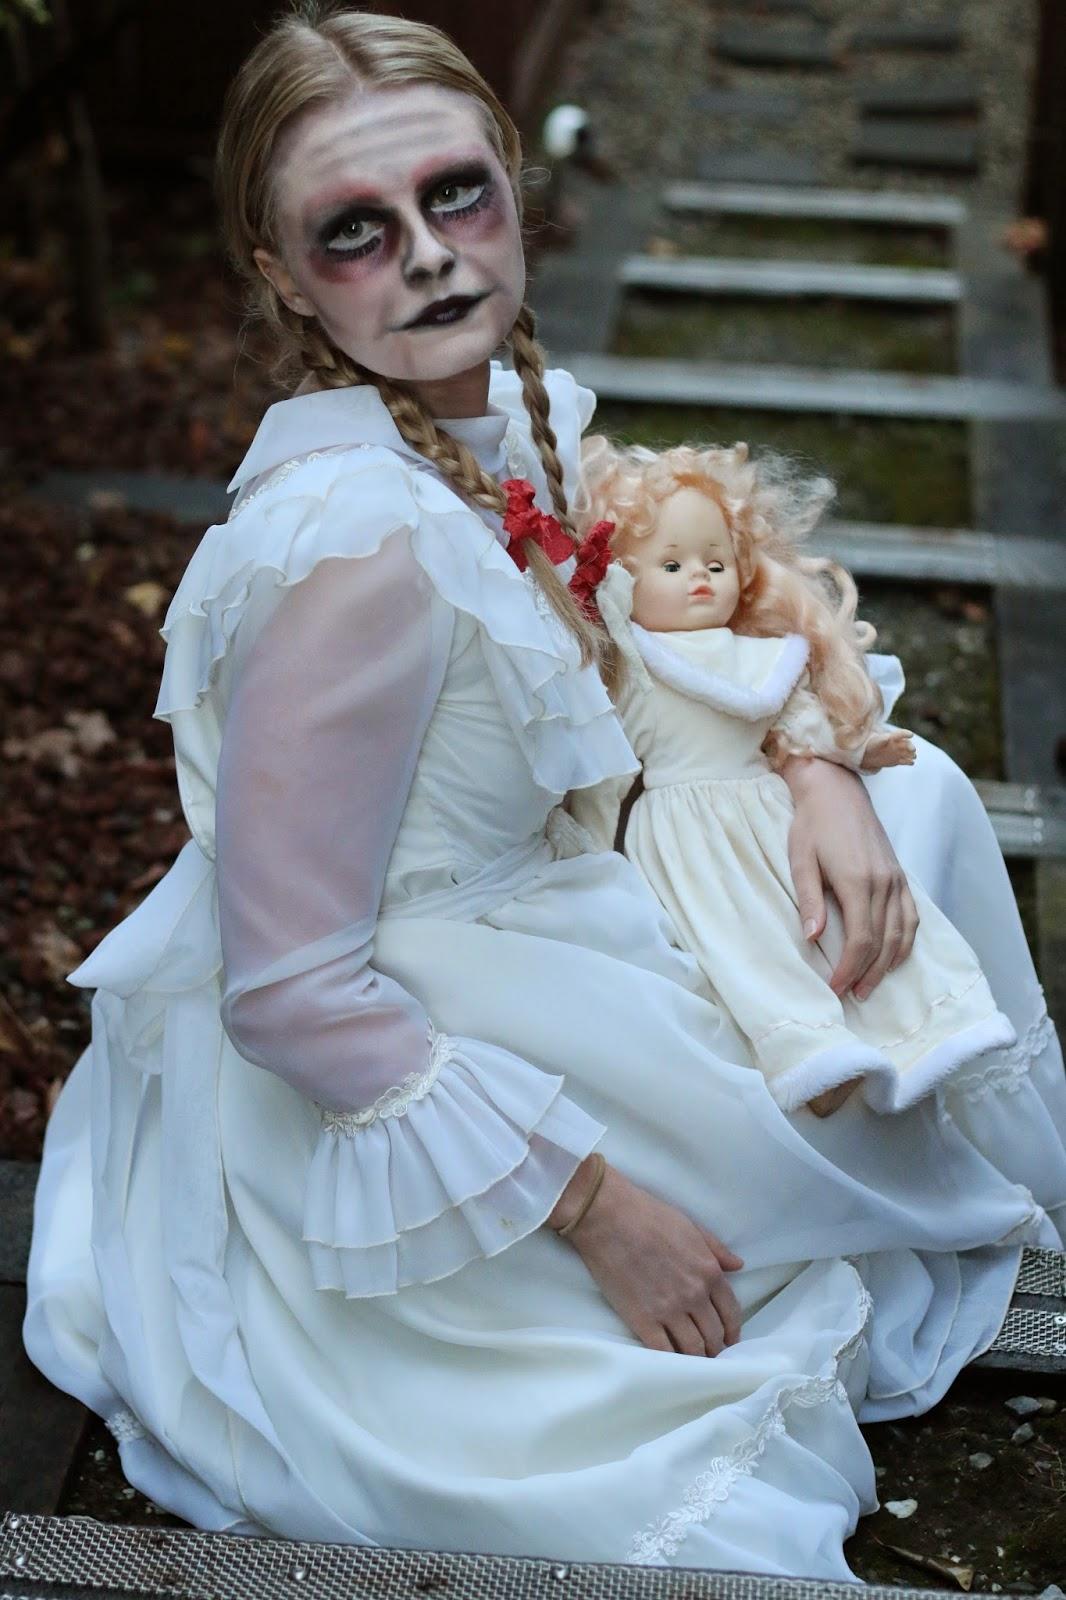 creepy little girl makeup